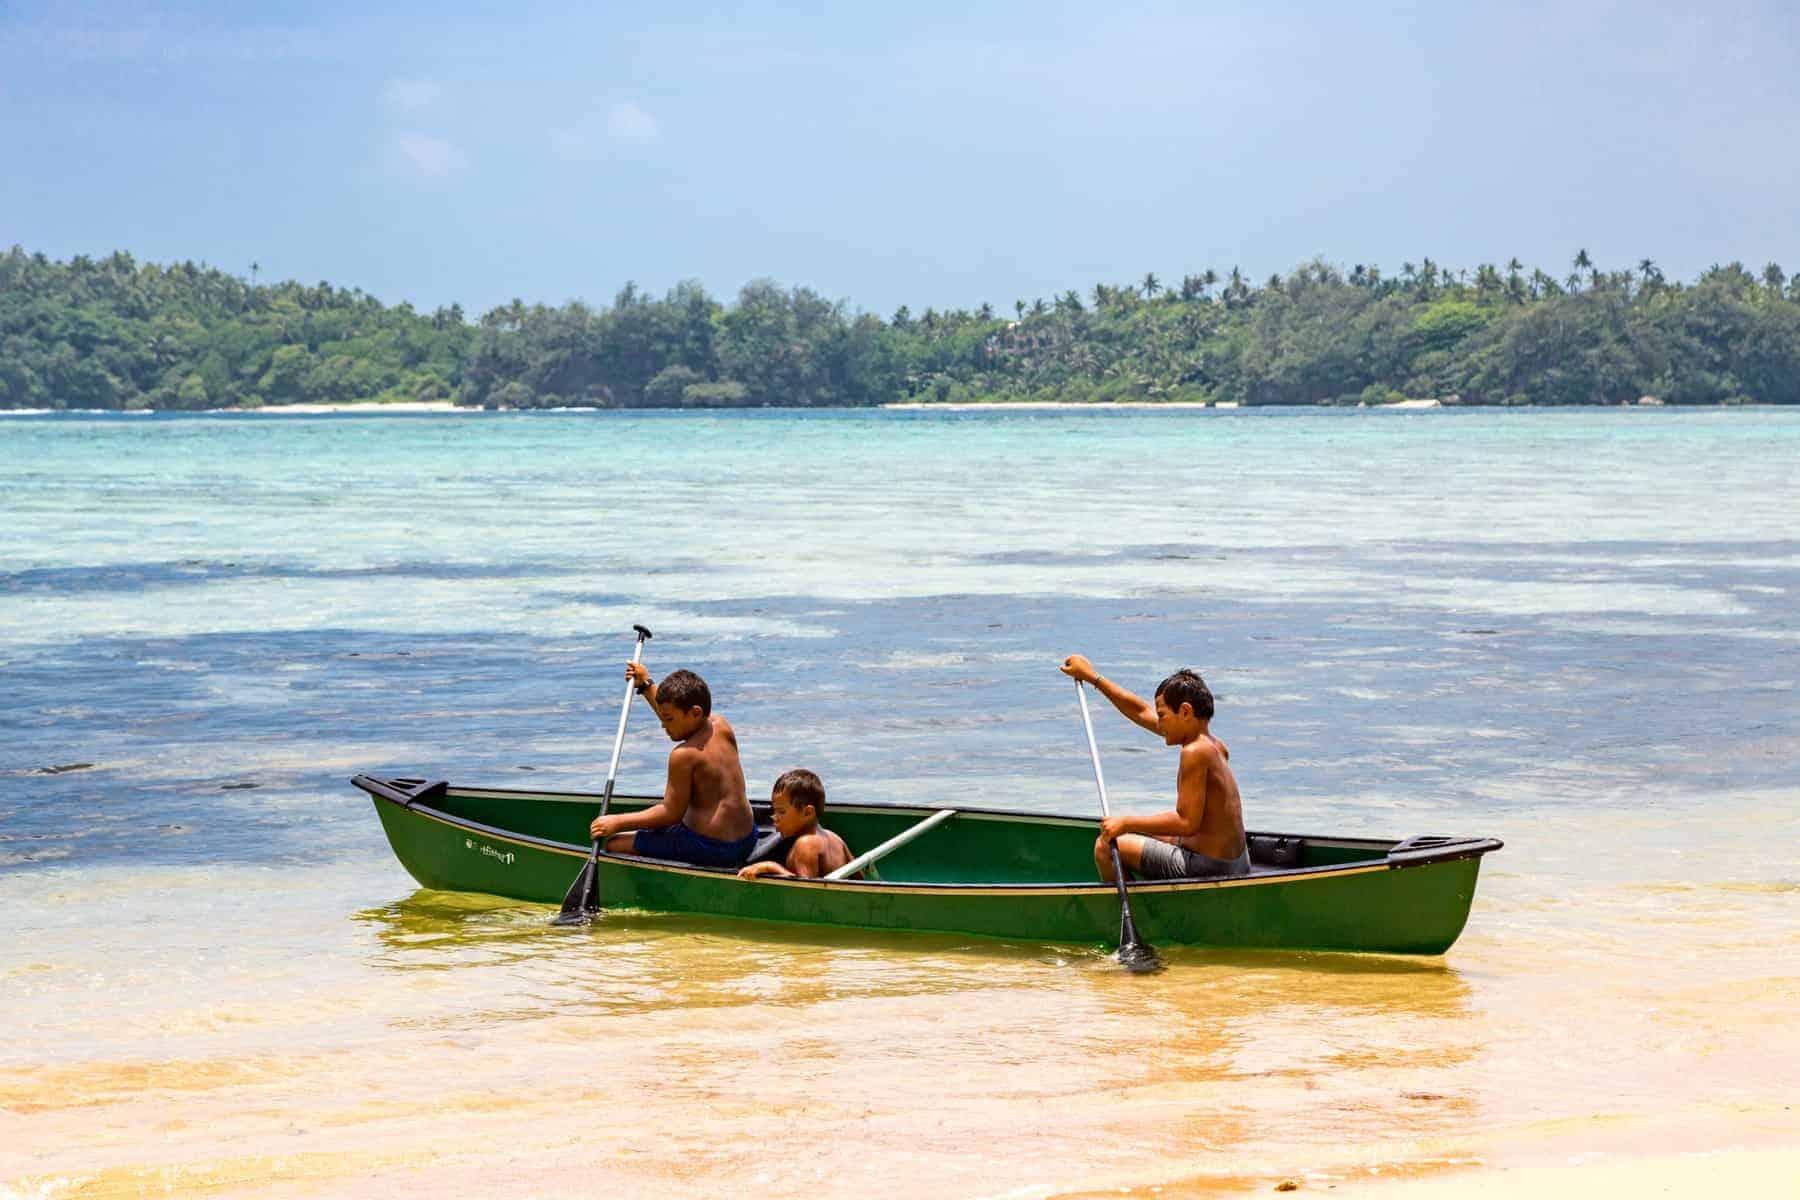 Vava`u island, Tonga, Polynesia, Oceania, South Pacific Ocean.